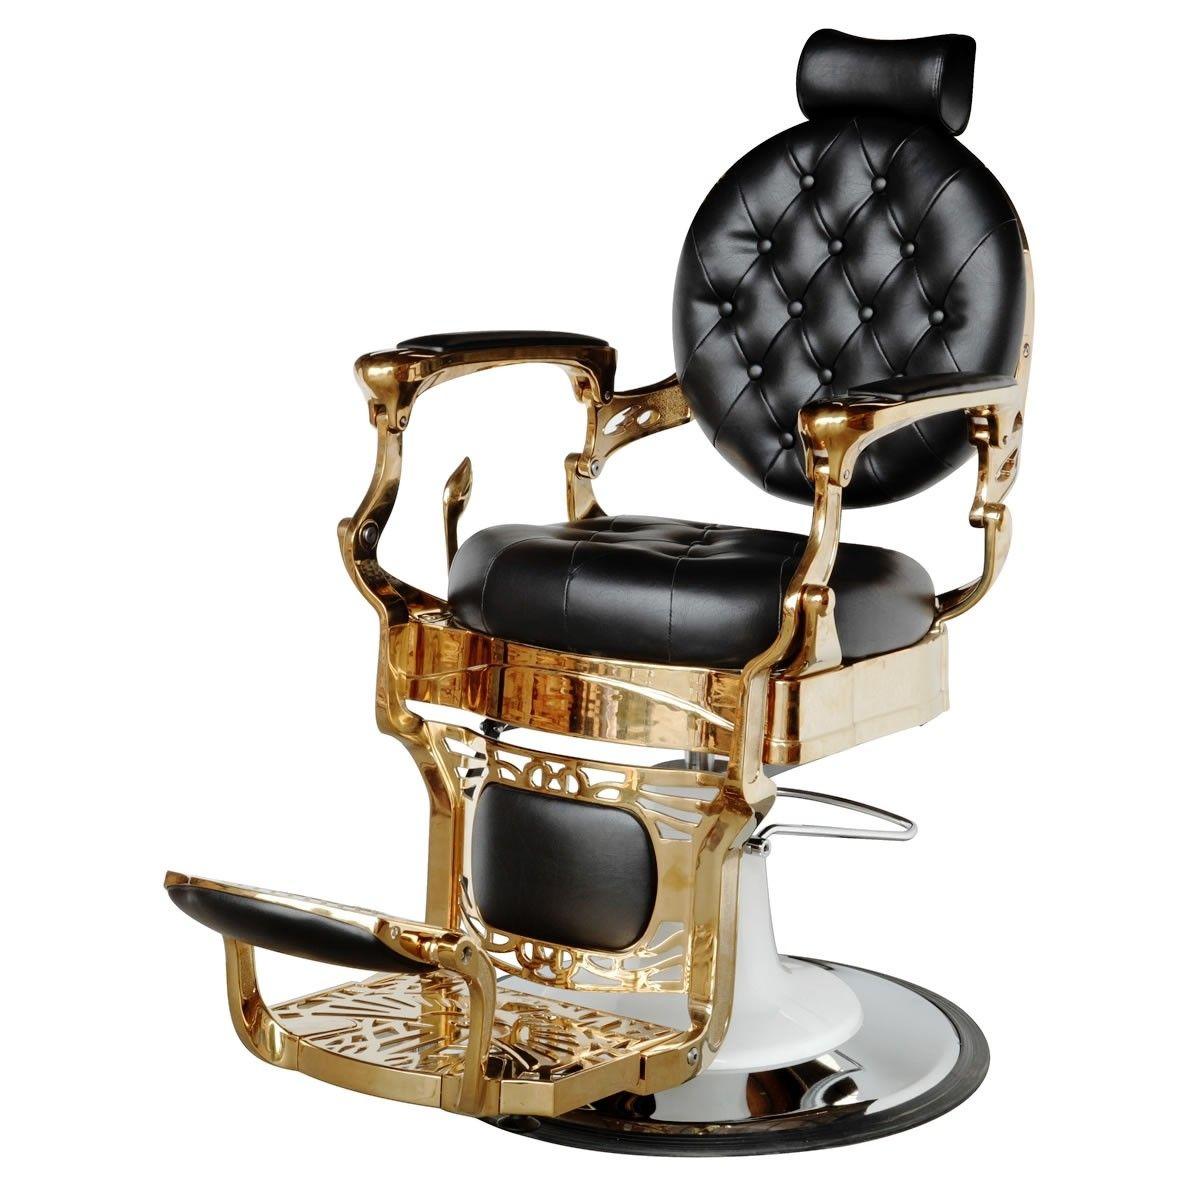 Theodore Golden Barber Chair Theodore Golden Barbershop Chair Theodore Barber Shop Chairs In Gold Barber Chair Barber Shop Chairs Barber Chair Vintage